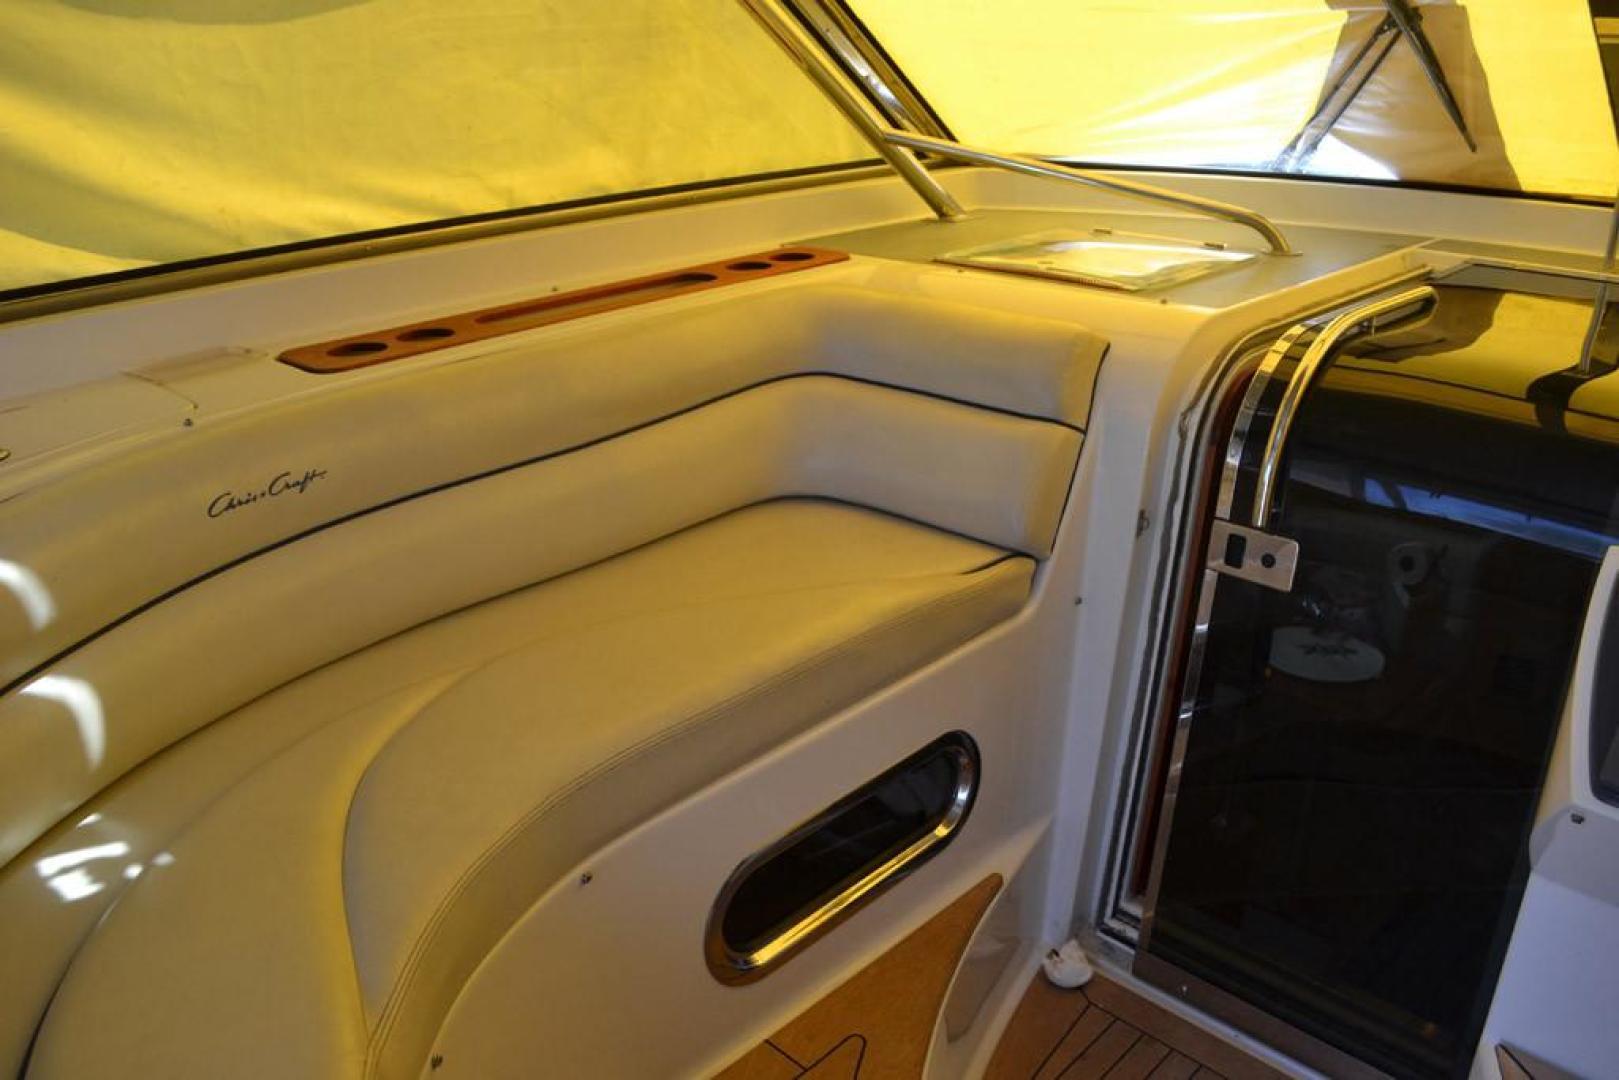 Chris-Craft-Roamer 2003-Lady Fairbanks Merritt Island-Florida-United States-Companion Seat-924484   Thumbnail